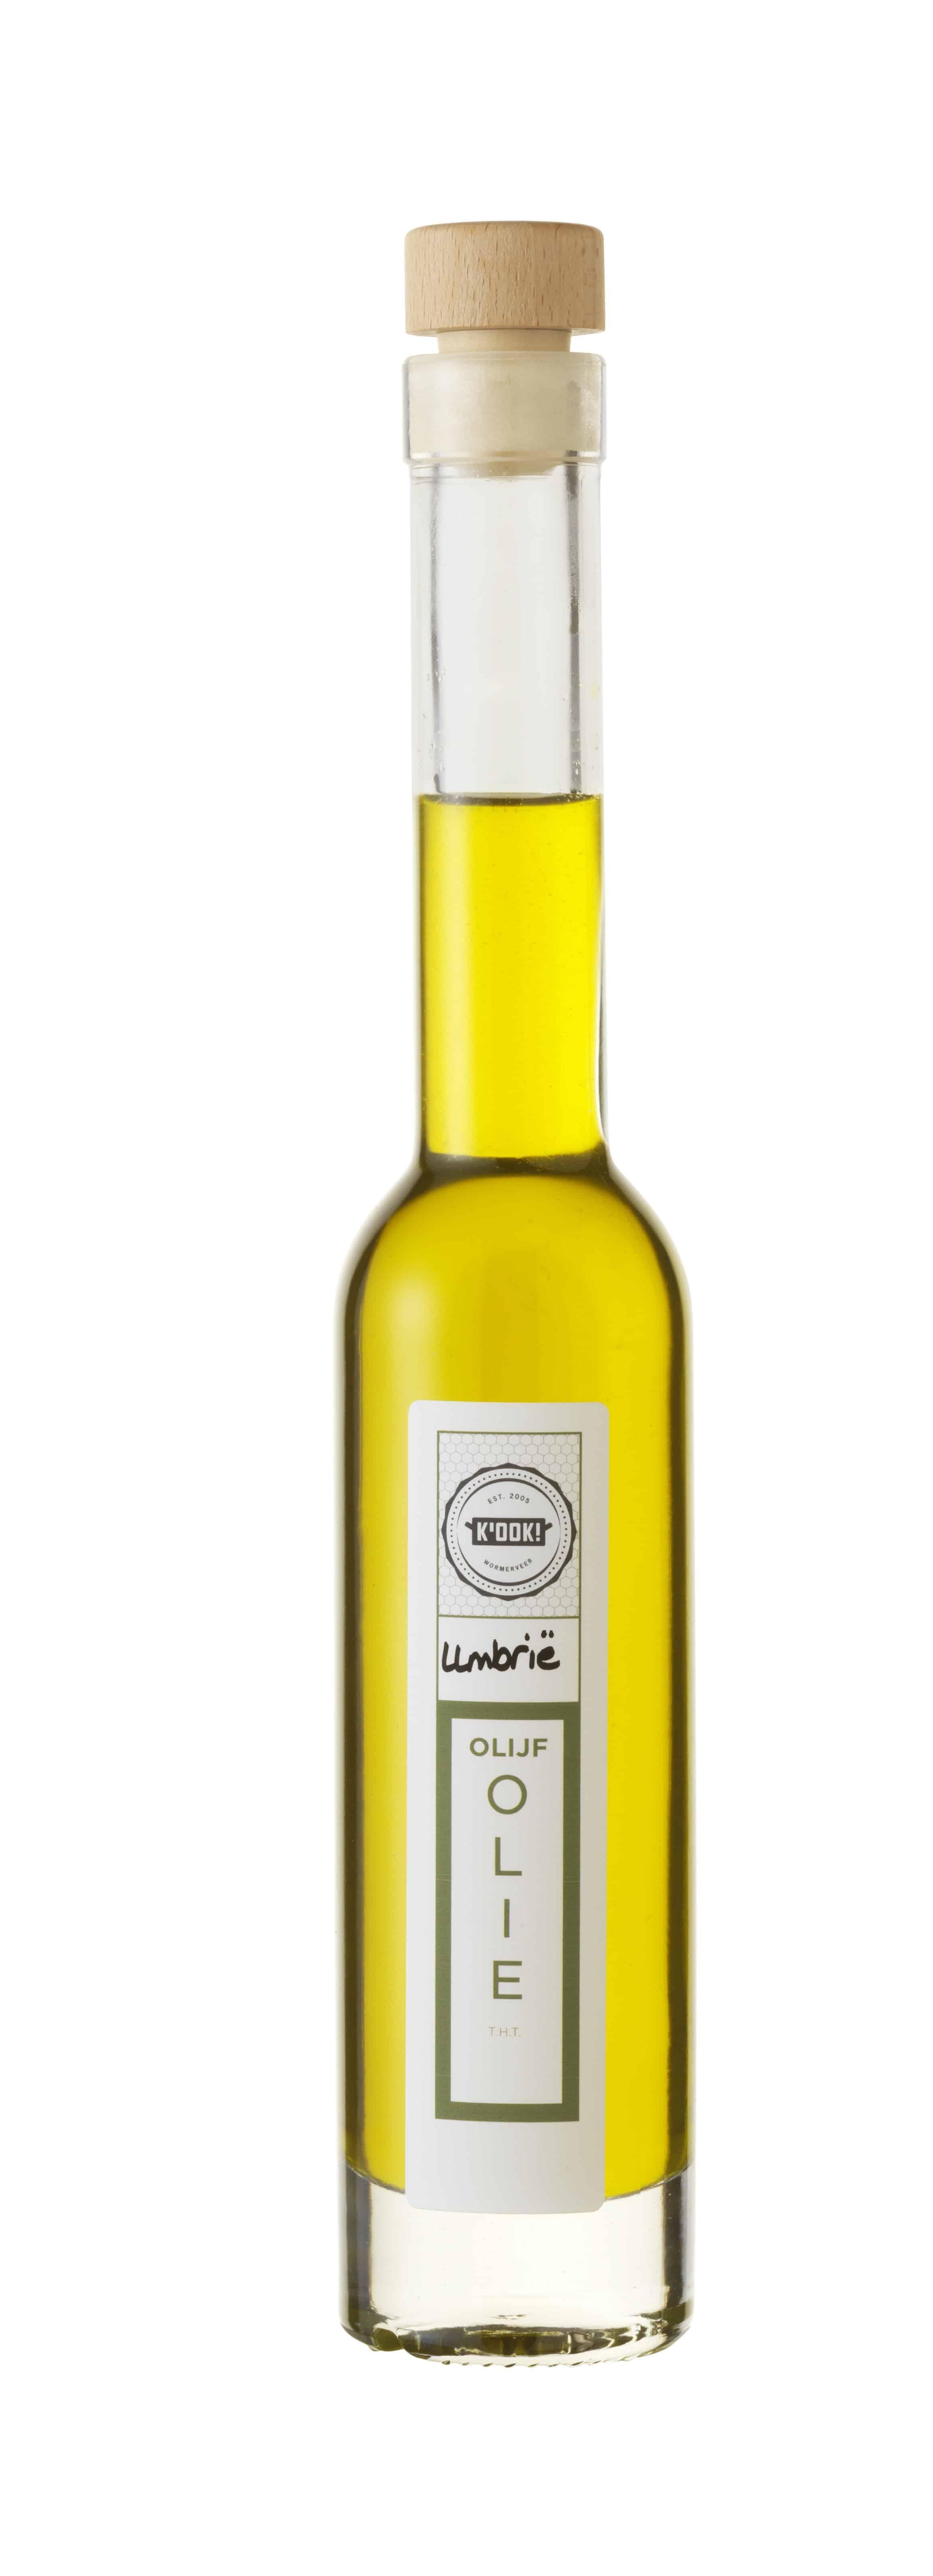 K'OOK! - extra vierge olijfolie Umbrië - diverse maten